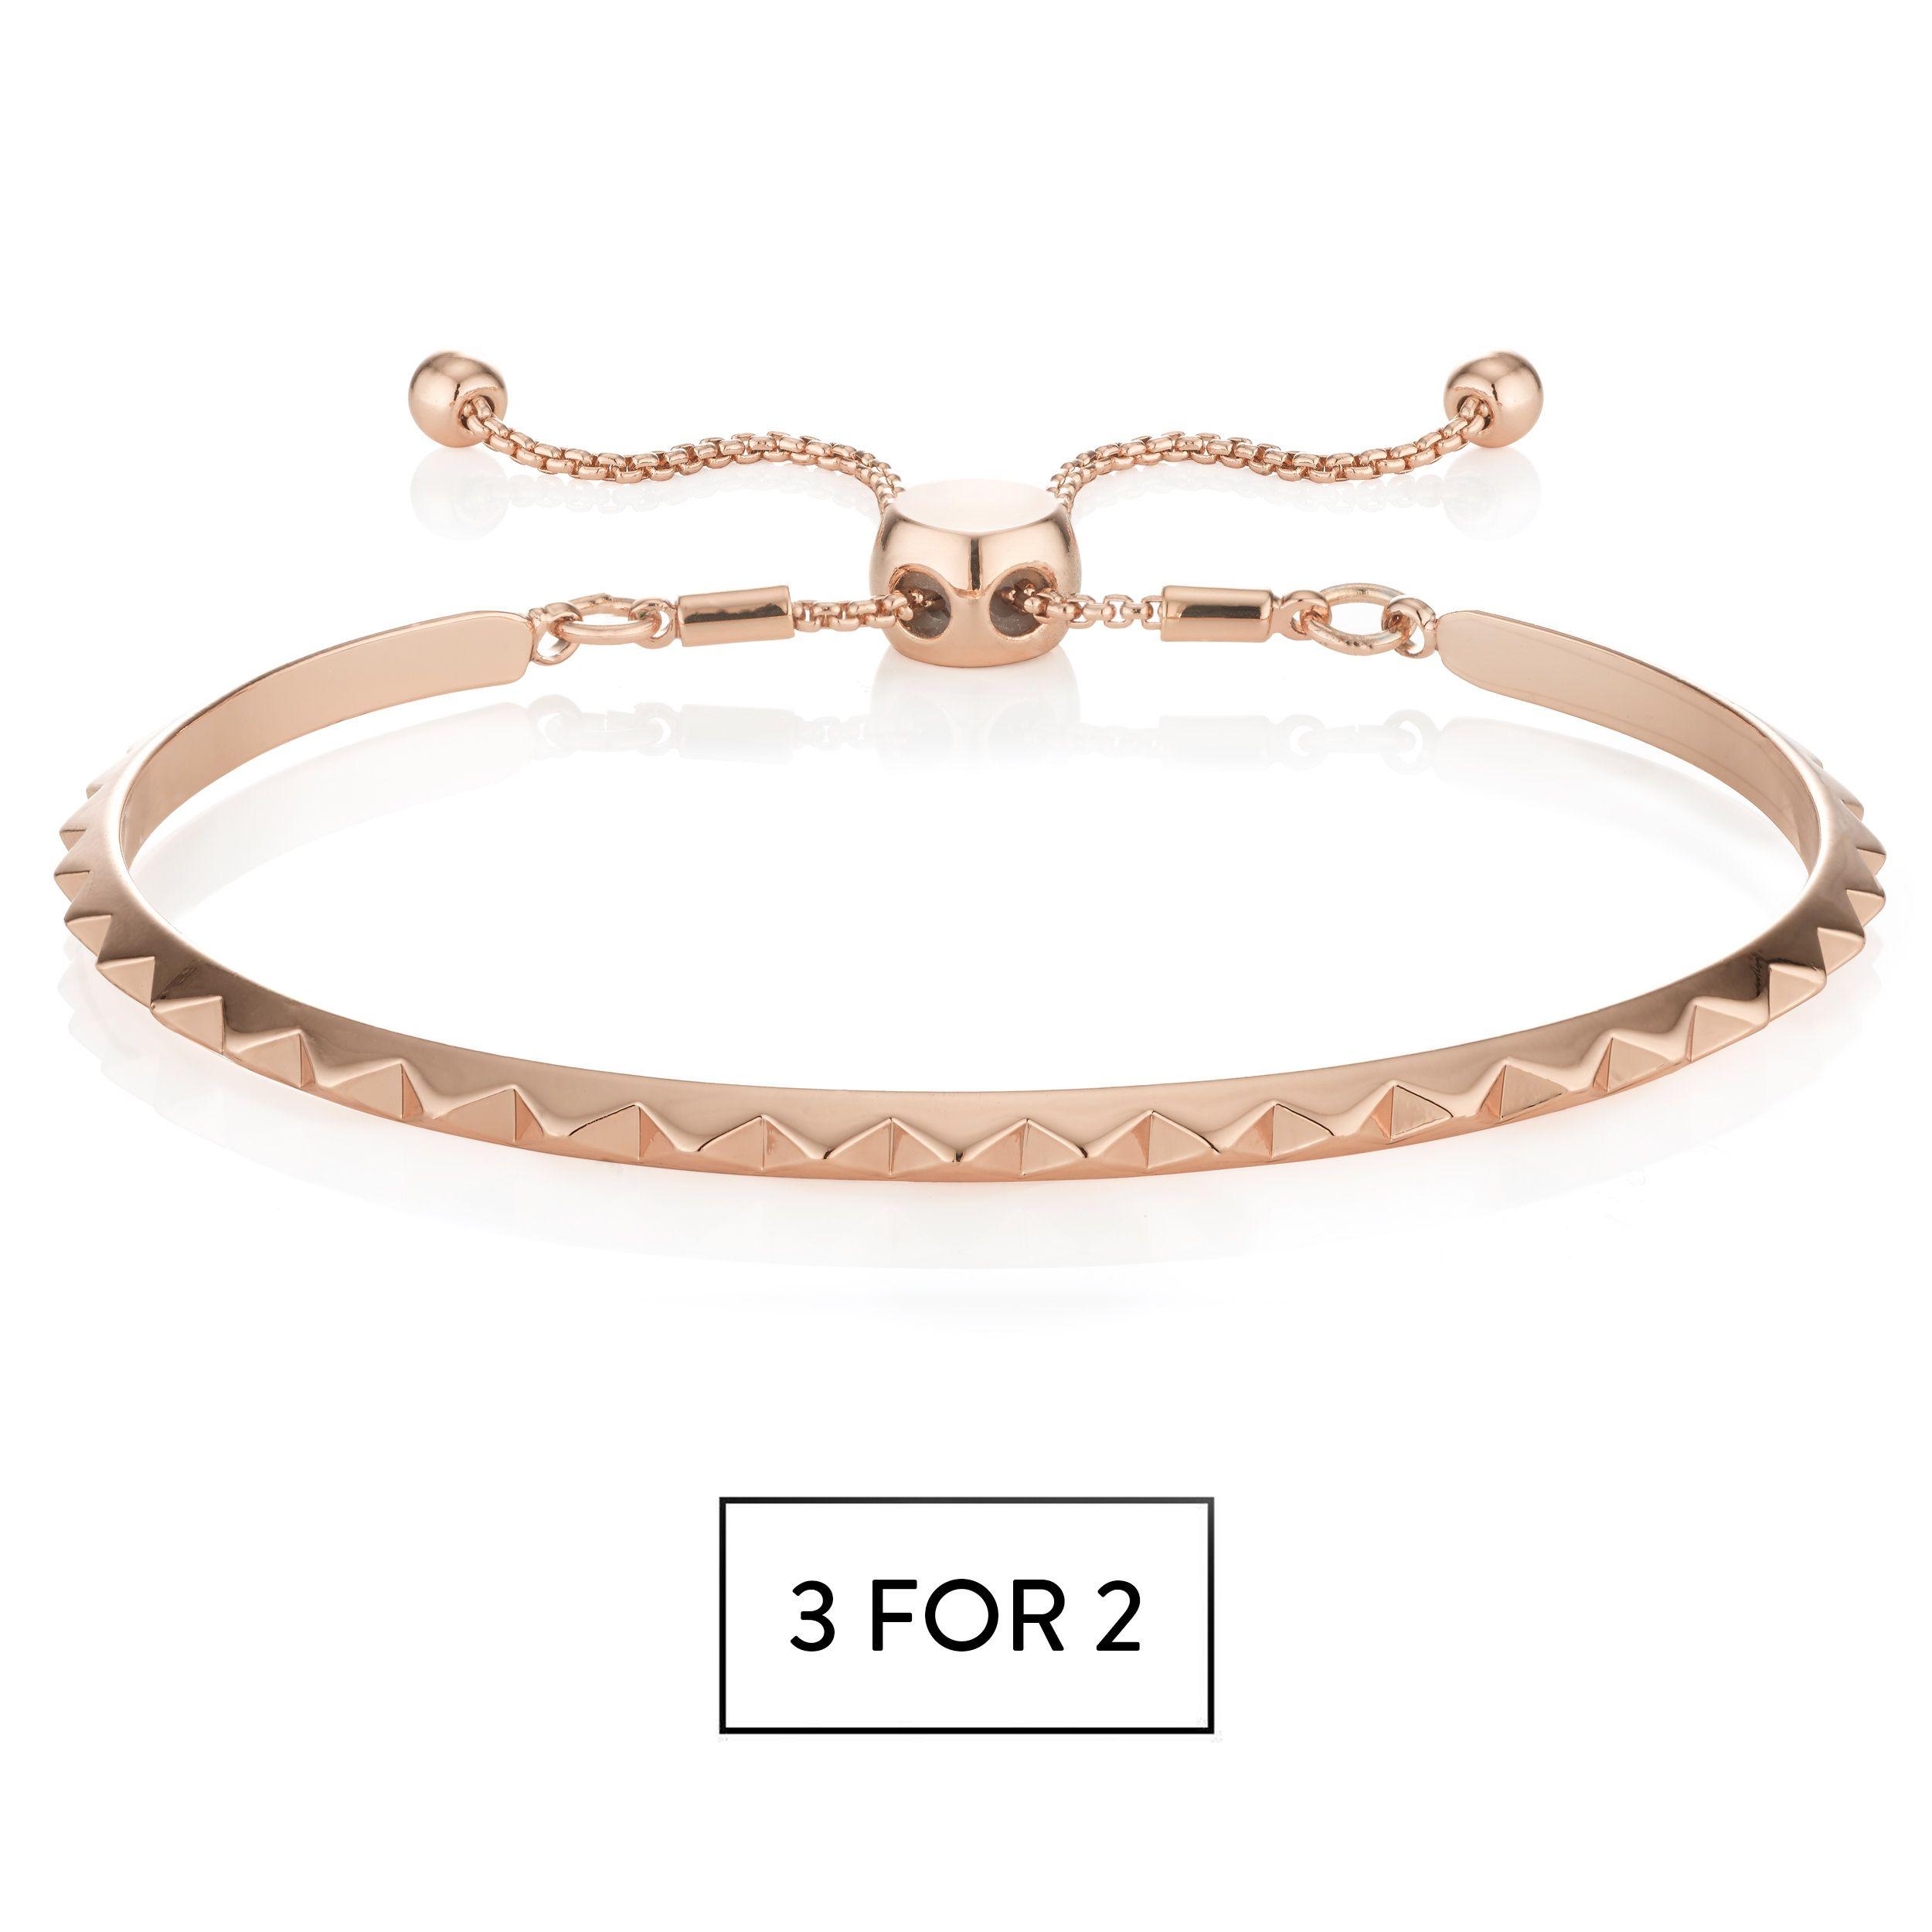 Buckley London Pyramid Bracelet - Rose Gold